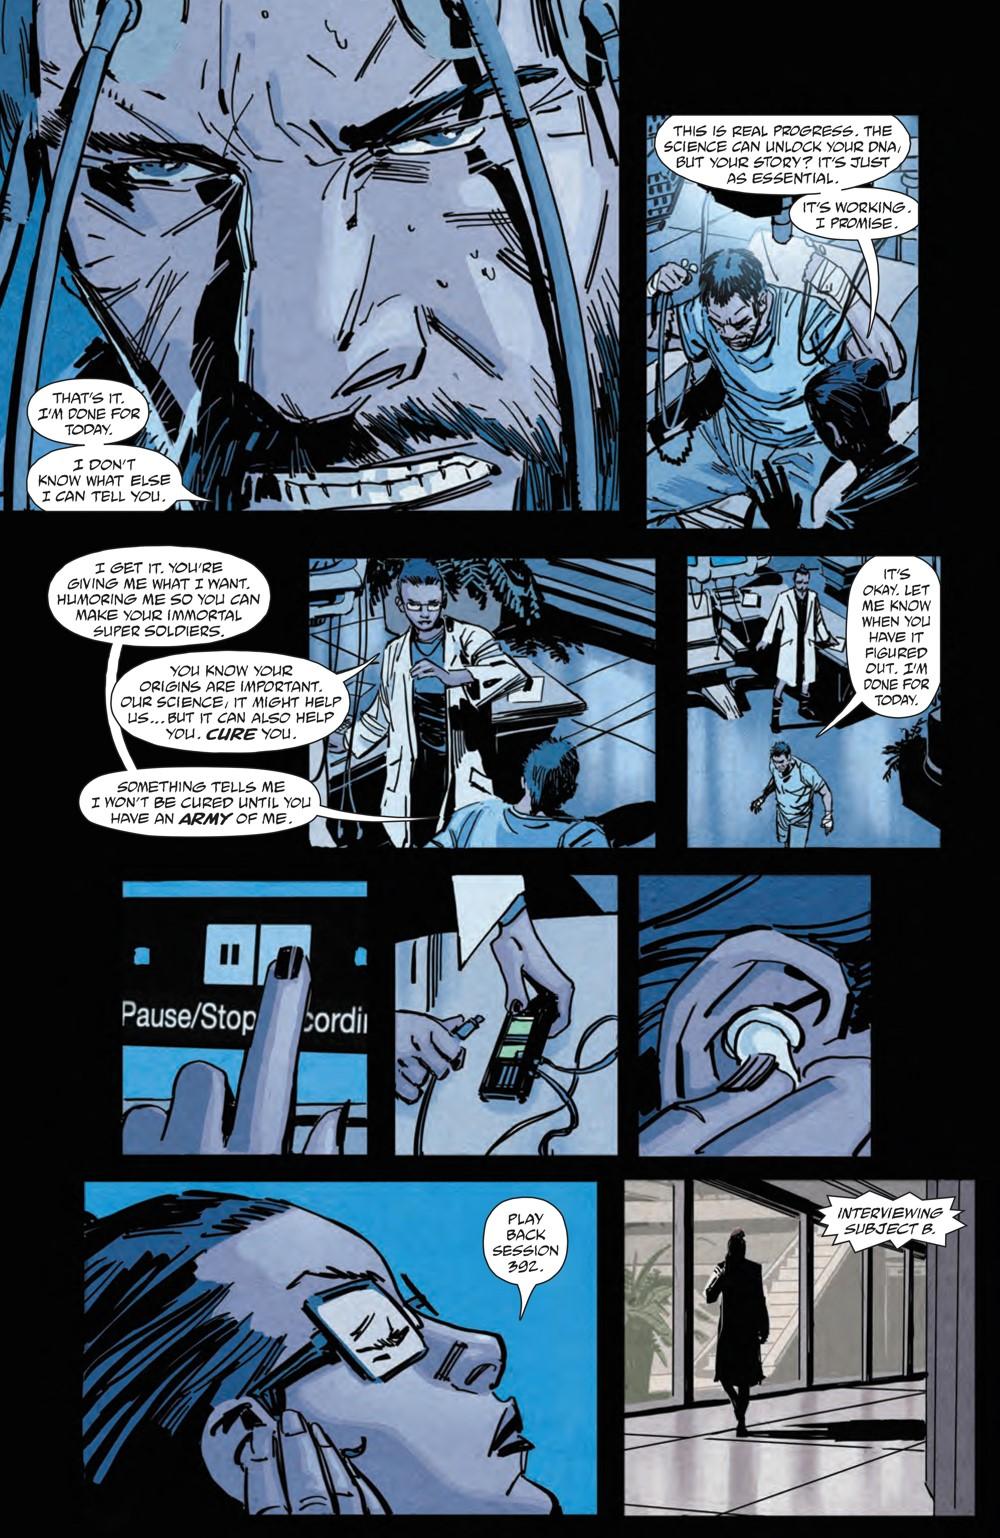 BRZRKR_004_PRESS_3 ComicList Previews: BRZRKR #4 (OF 12)